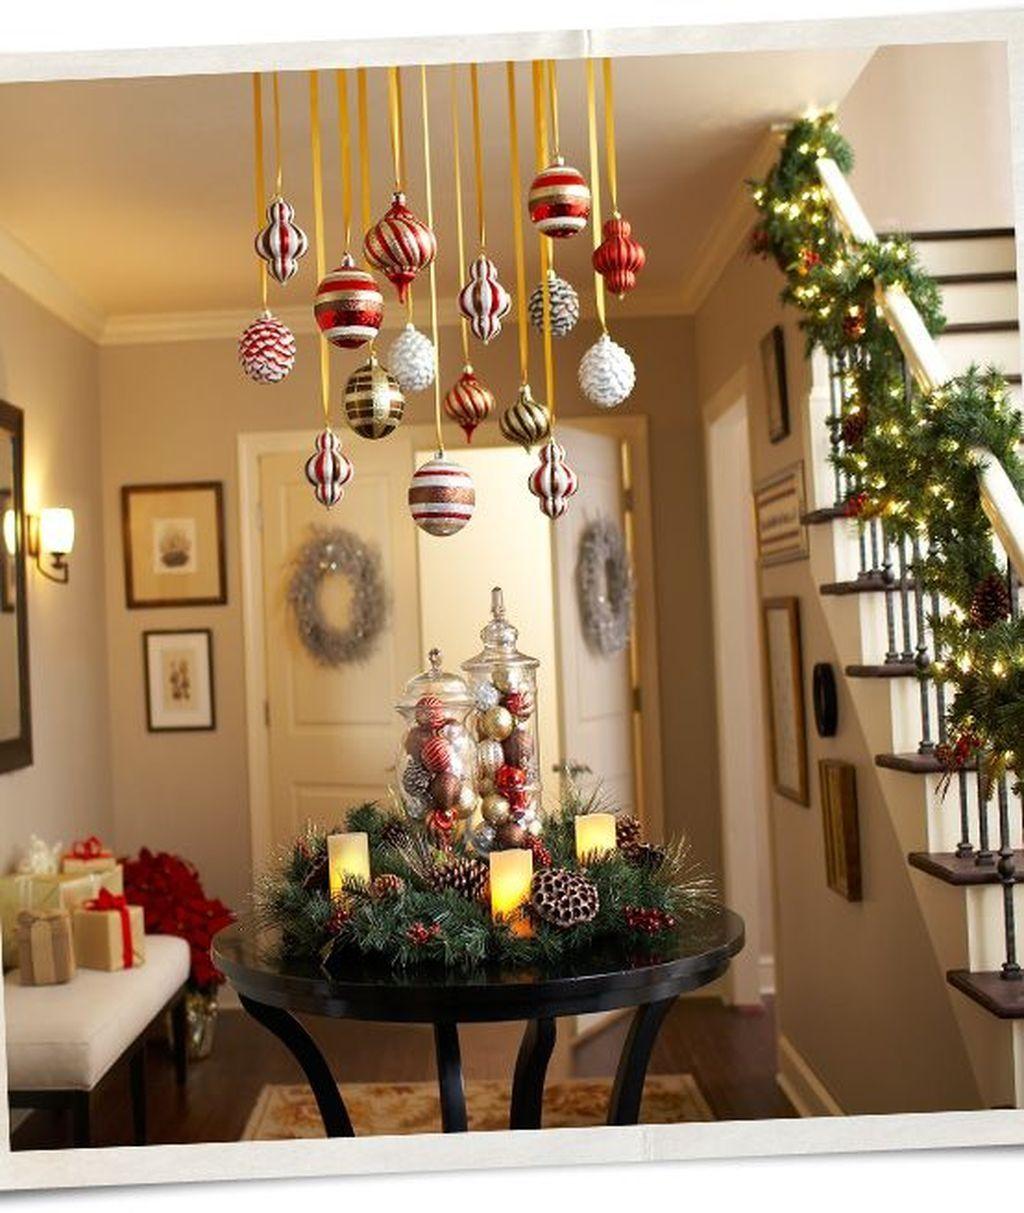 43 Elegant Hanging Ceiling Winter Decoration Ideas Christmas Hanging Decorations Christmas Ceiling Decorations Holiday Decor